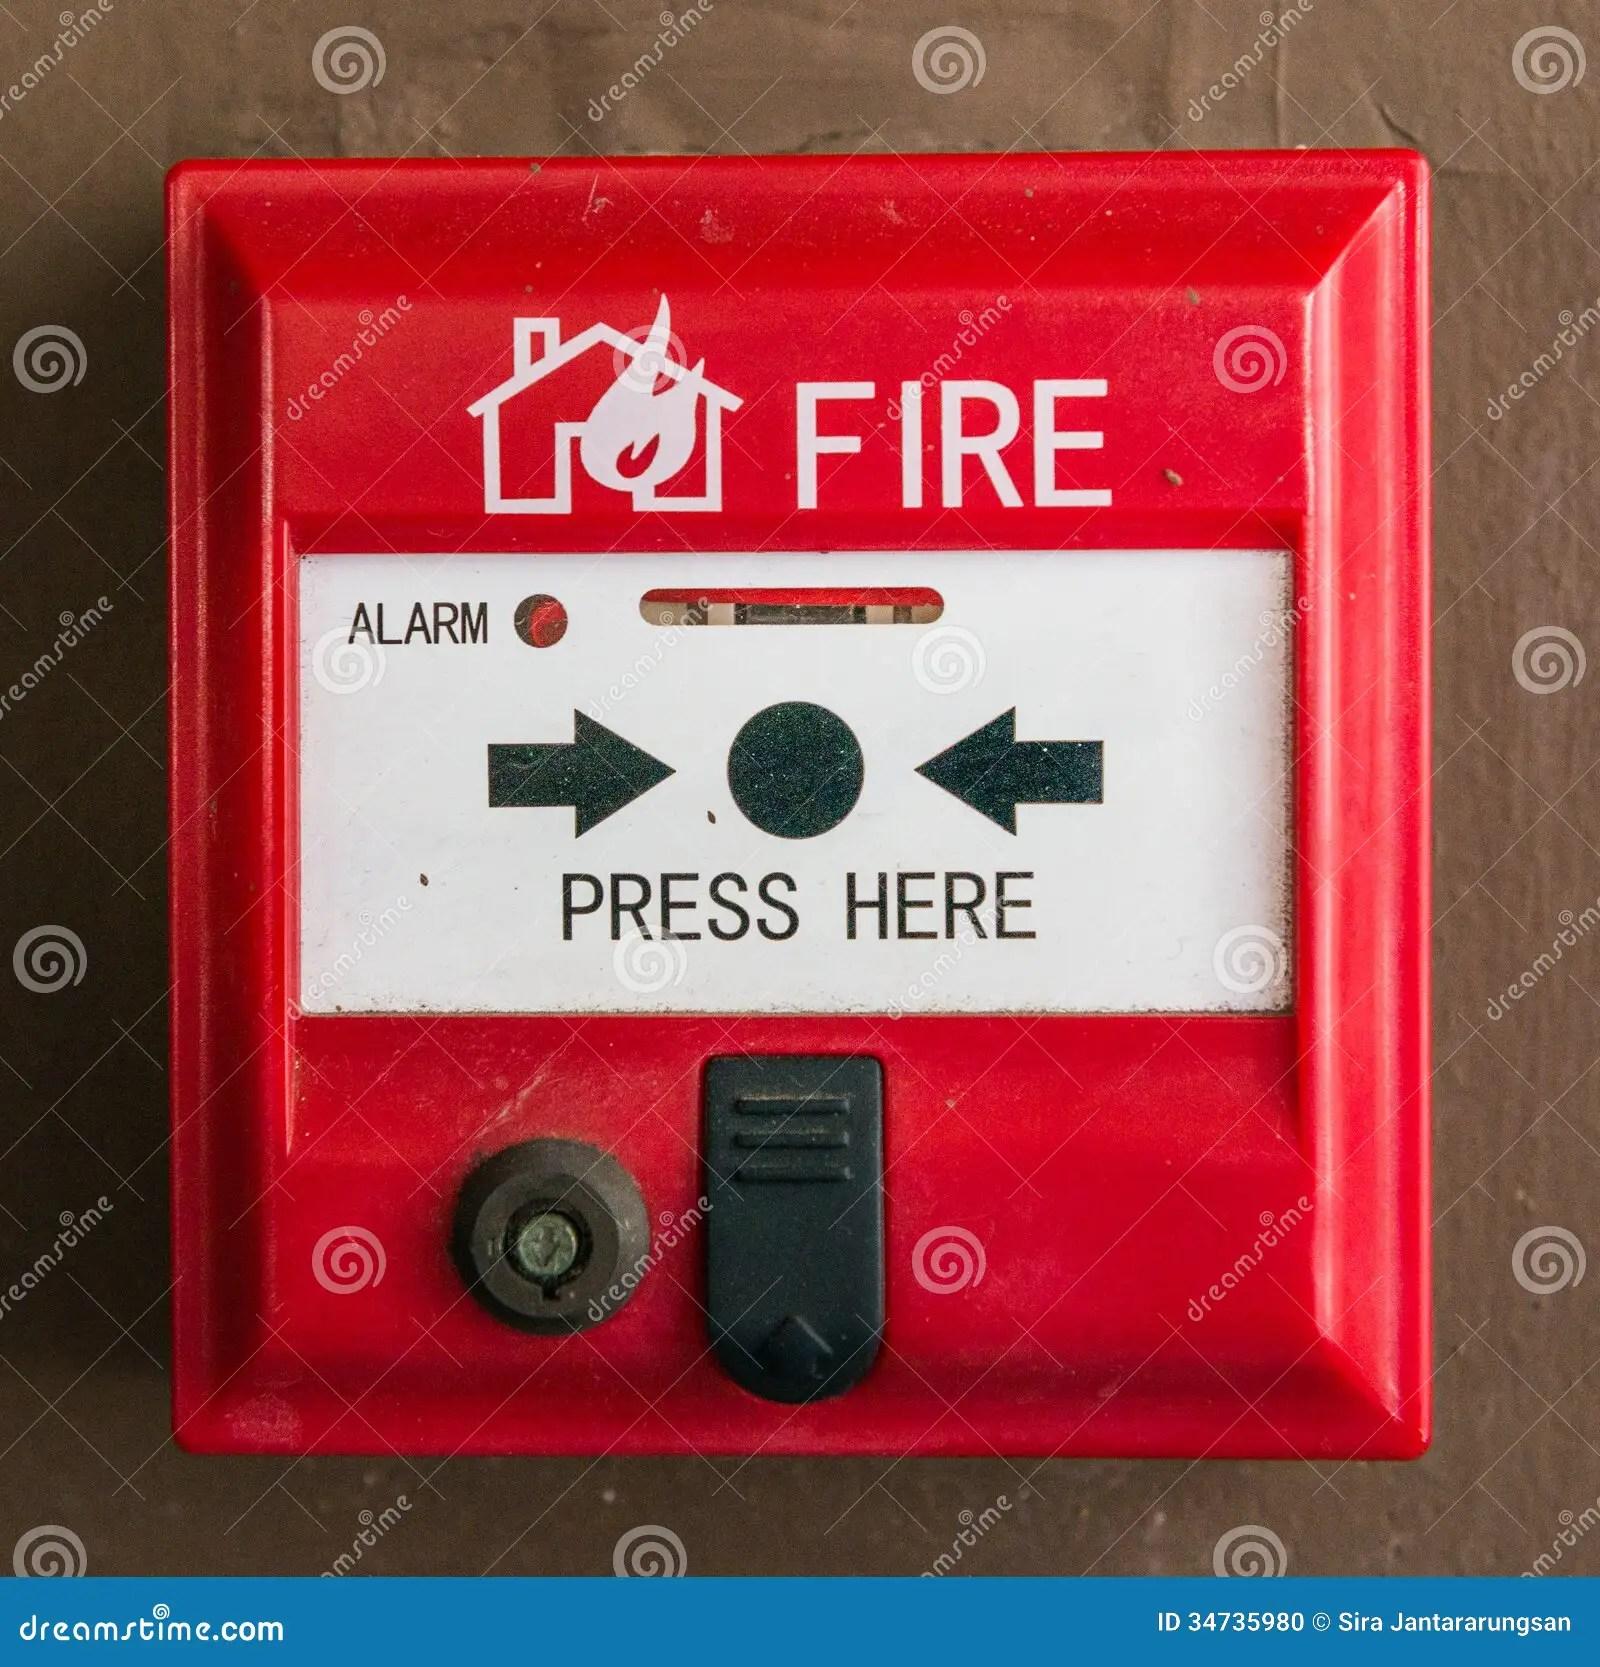 Fire Alarm Sound